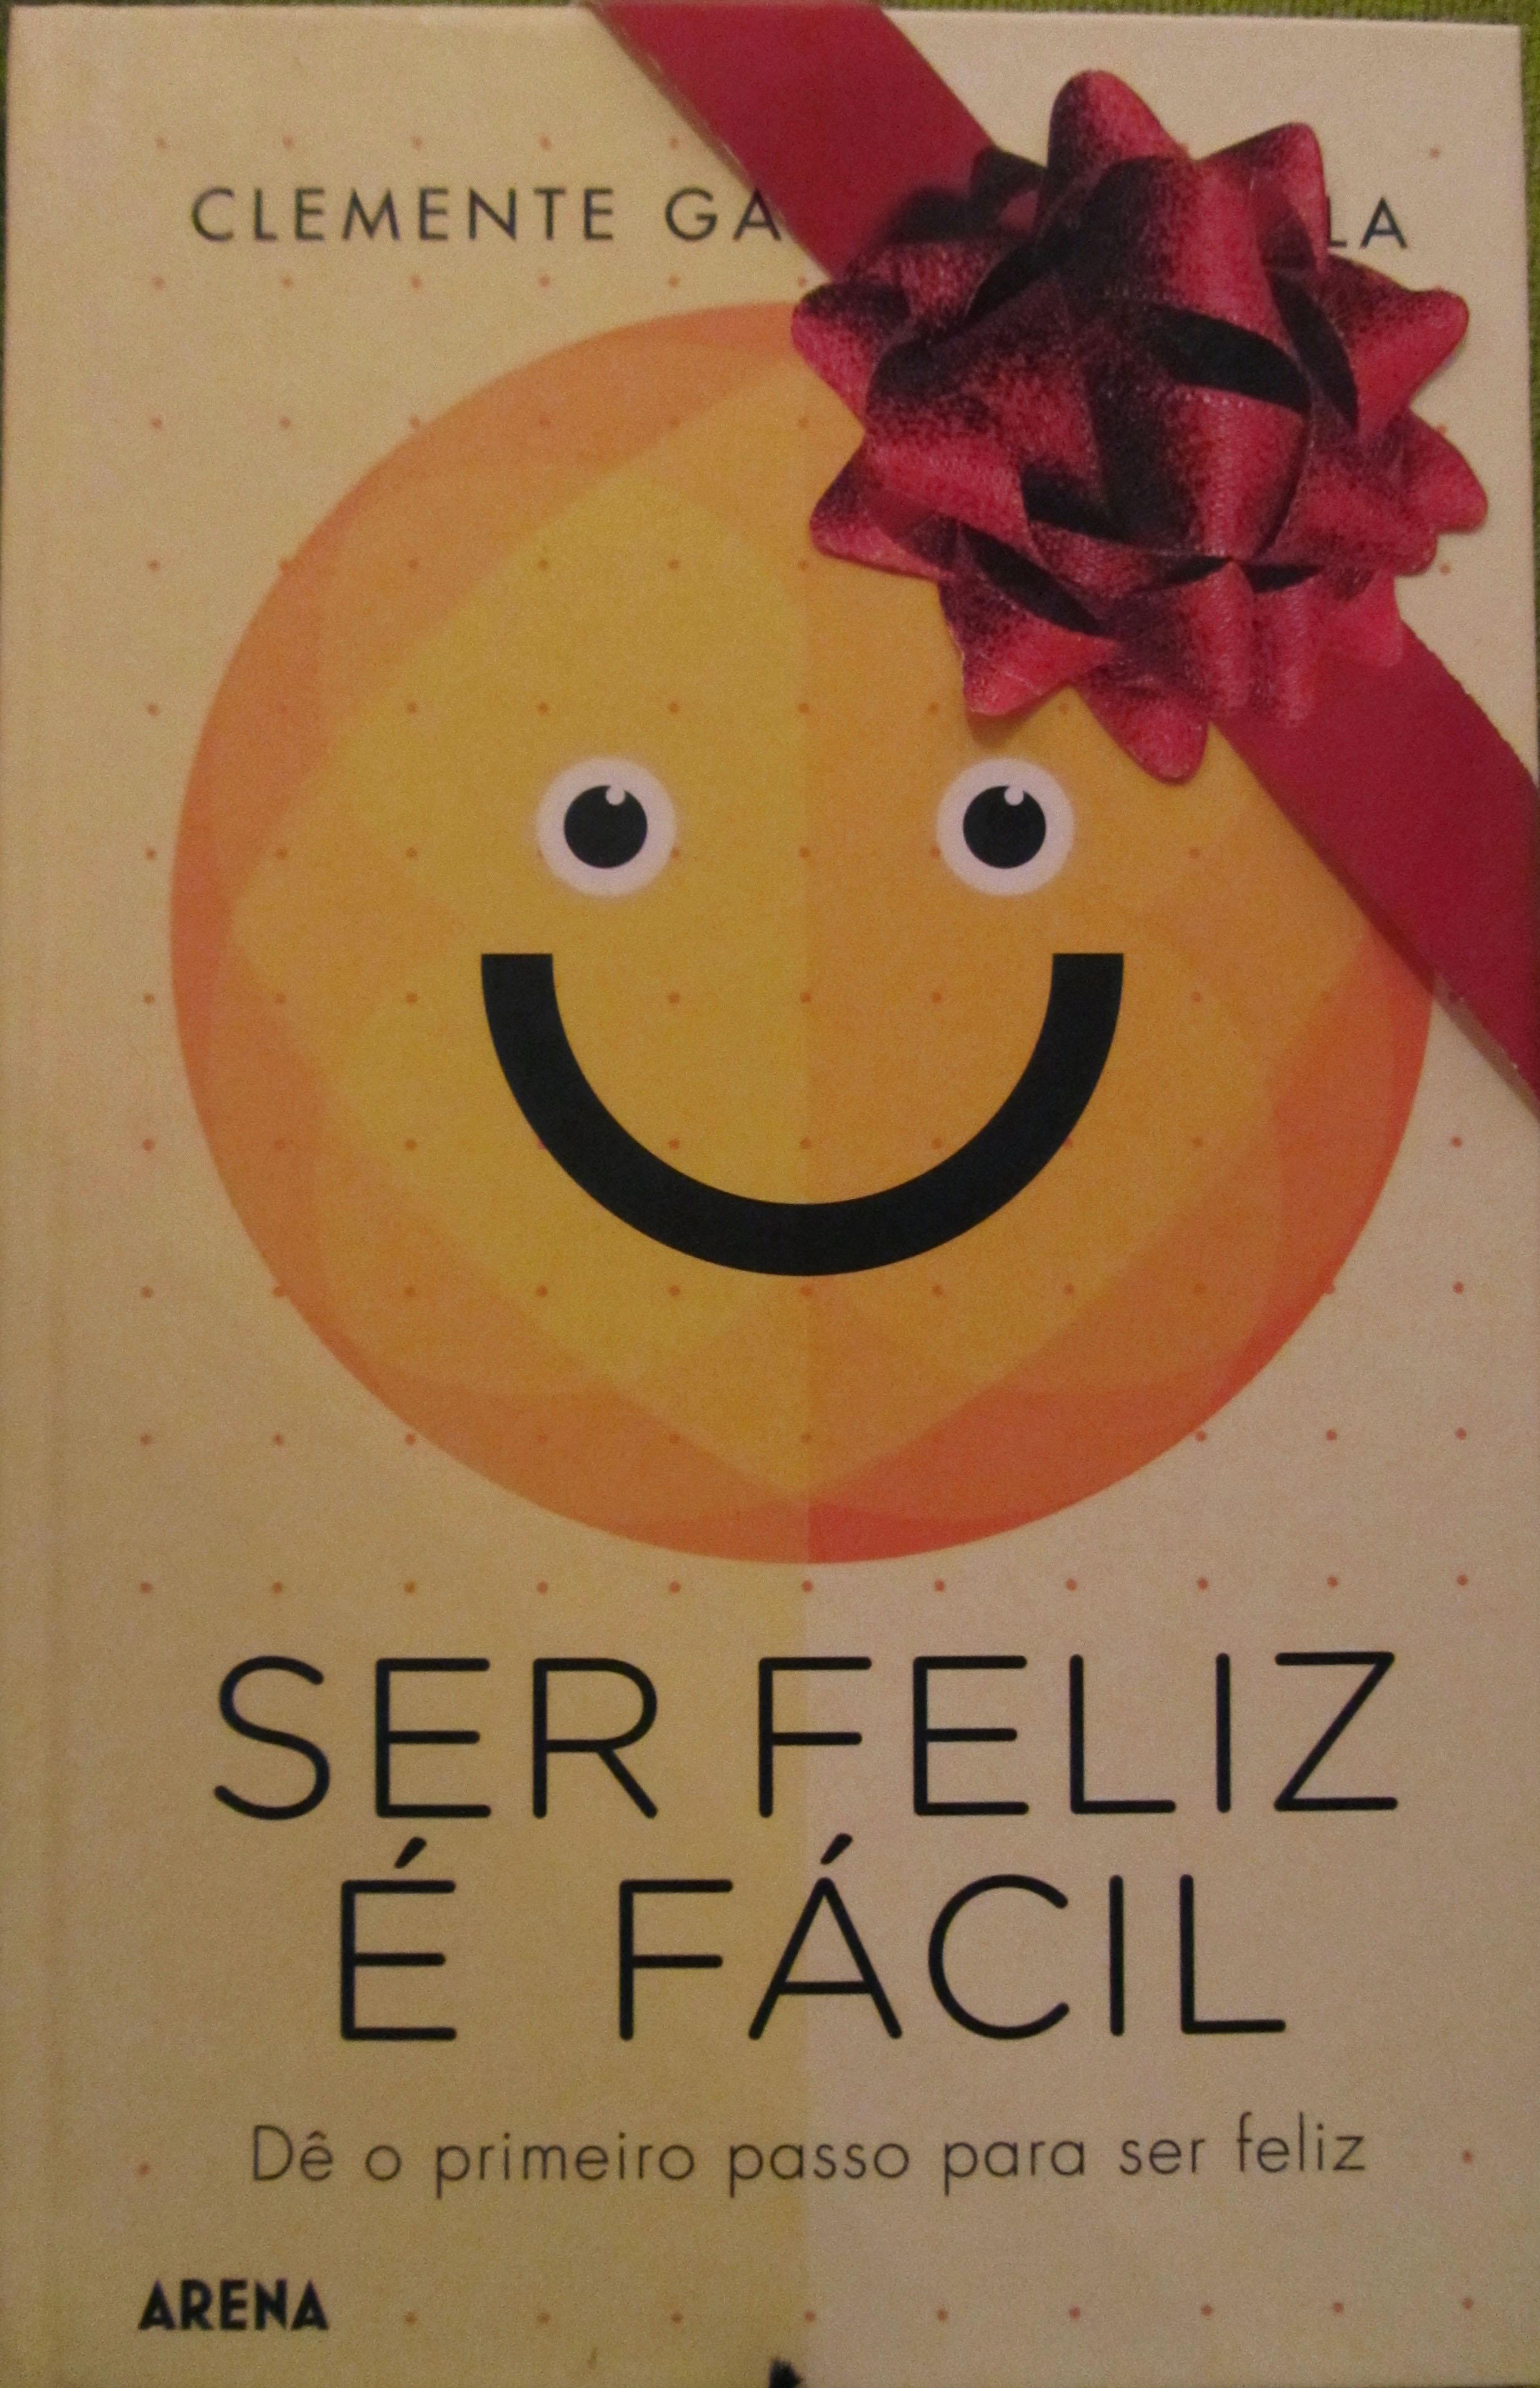 ser feliz é fácil